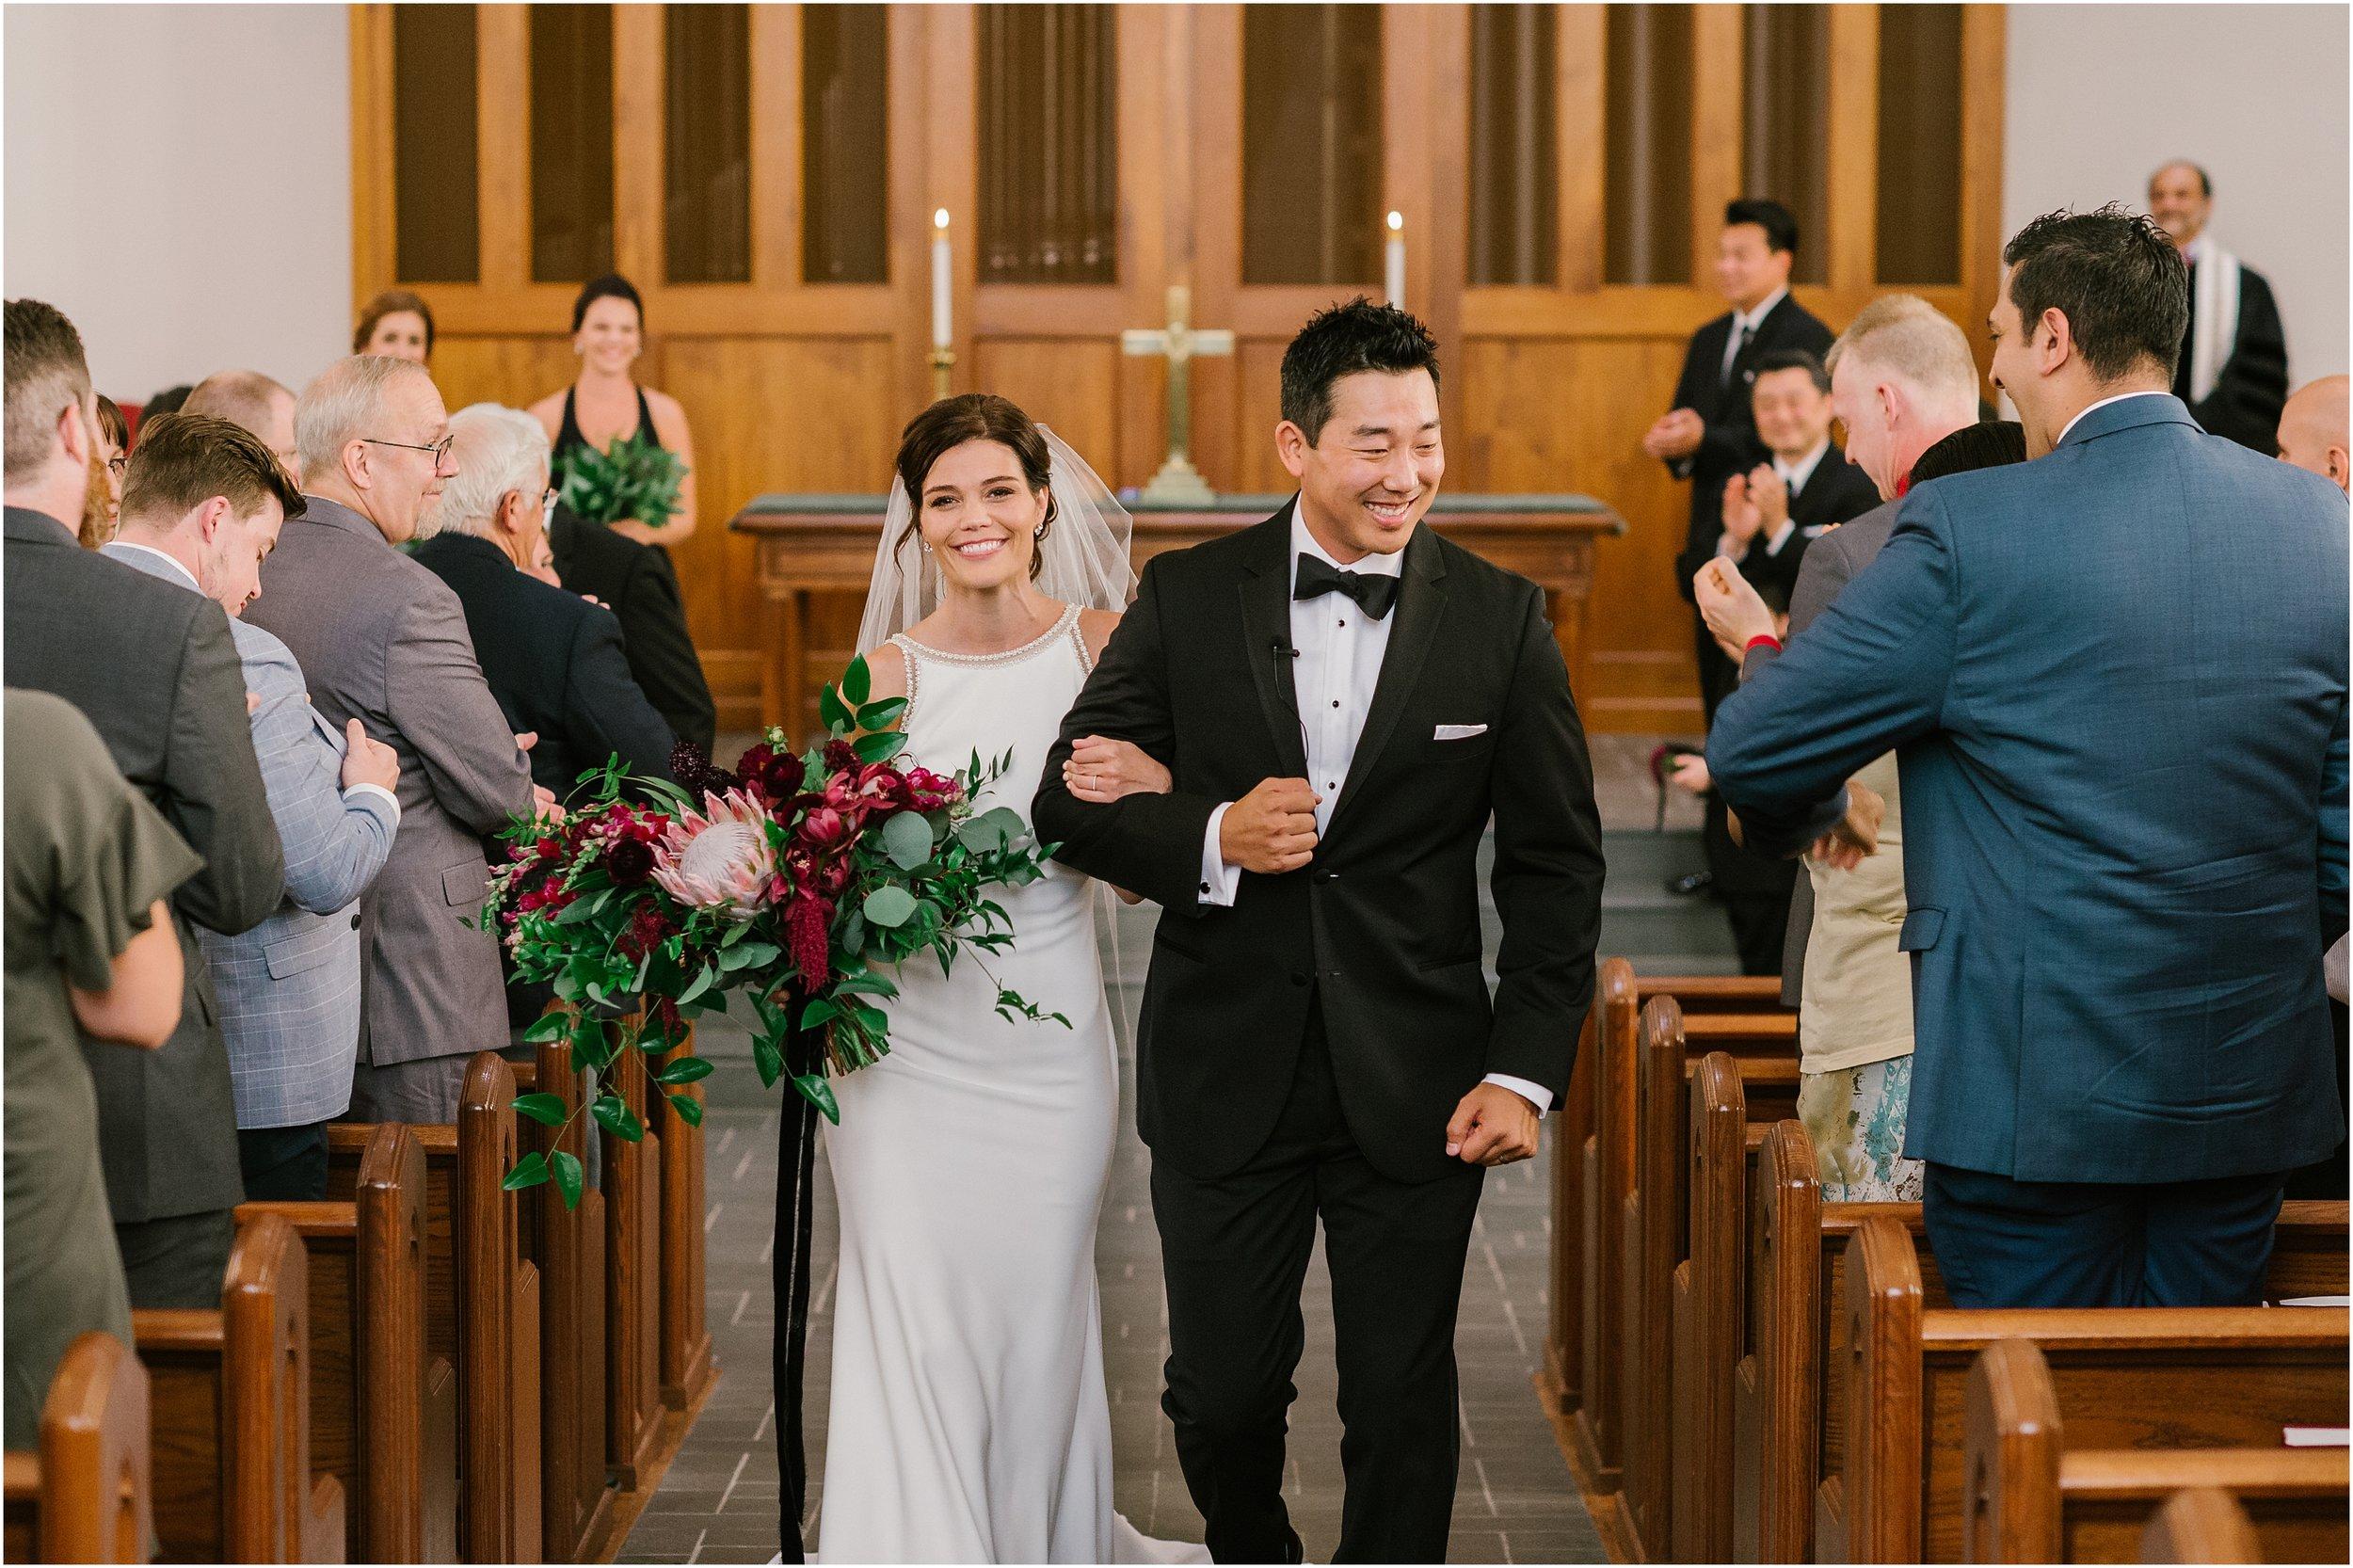 Rebecca_Shehorn_Photography_Indianapolis Wedding Photographer Sycamore at Mallow Run Wedding_9732.jpg